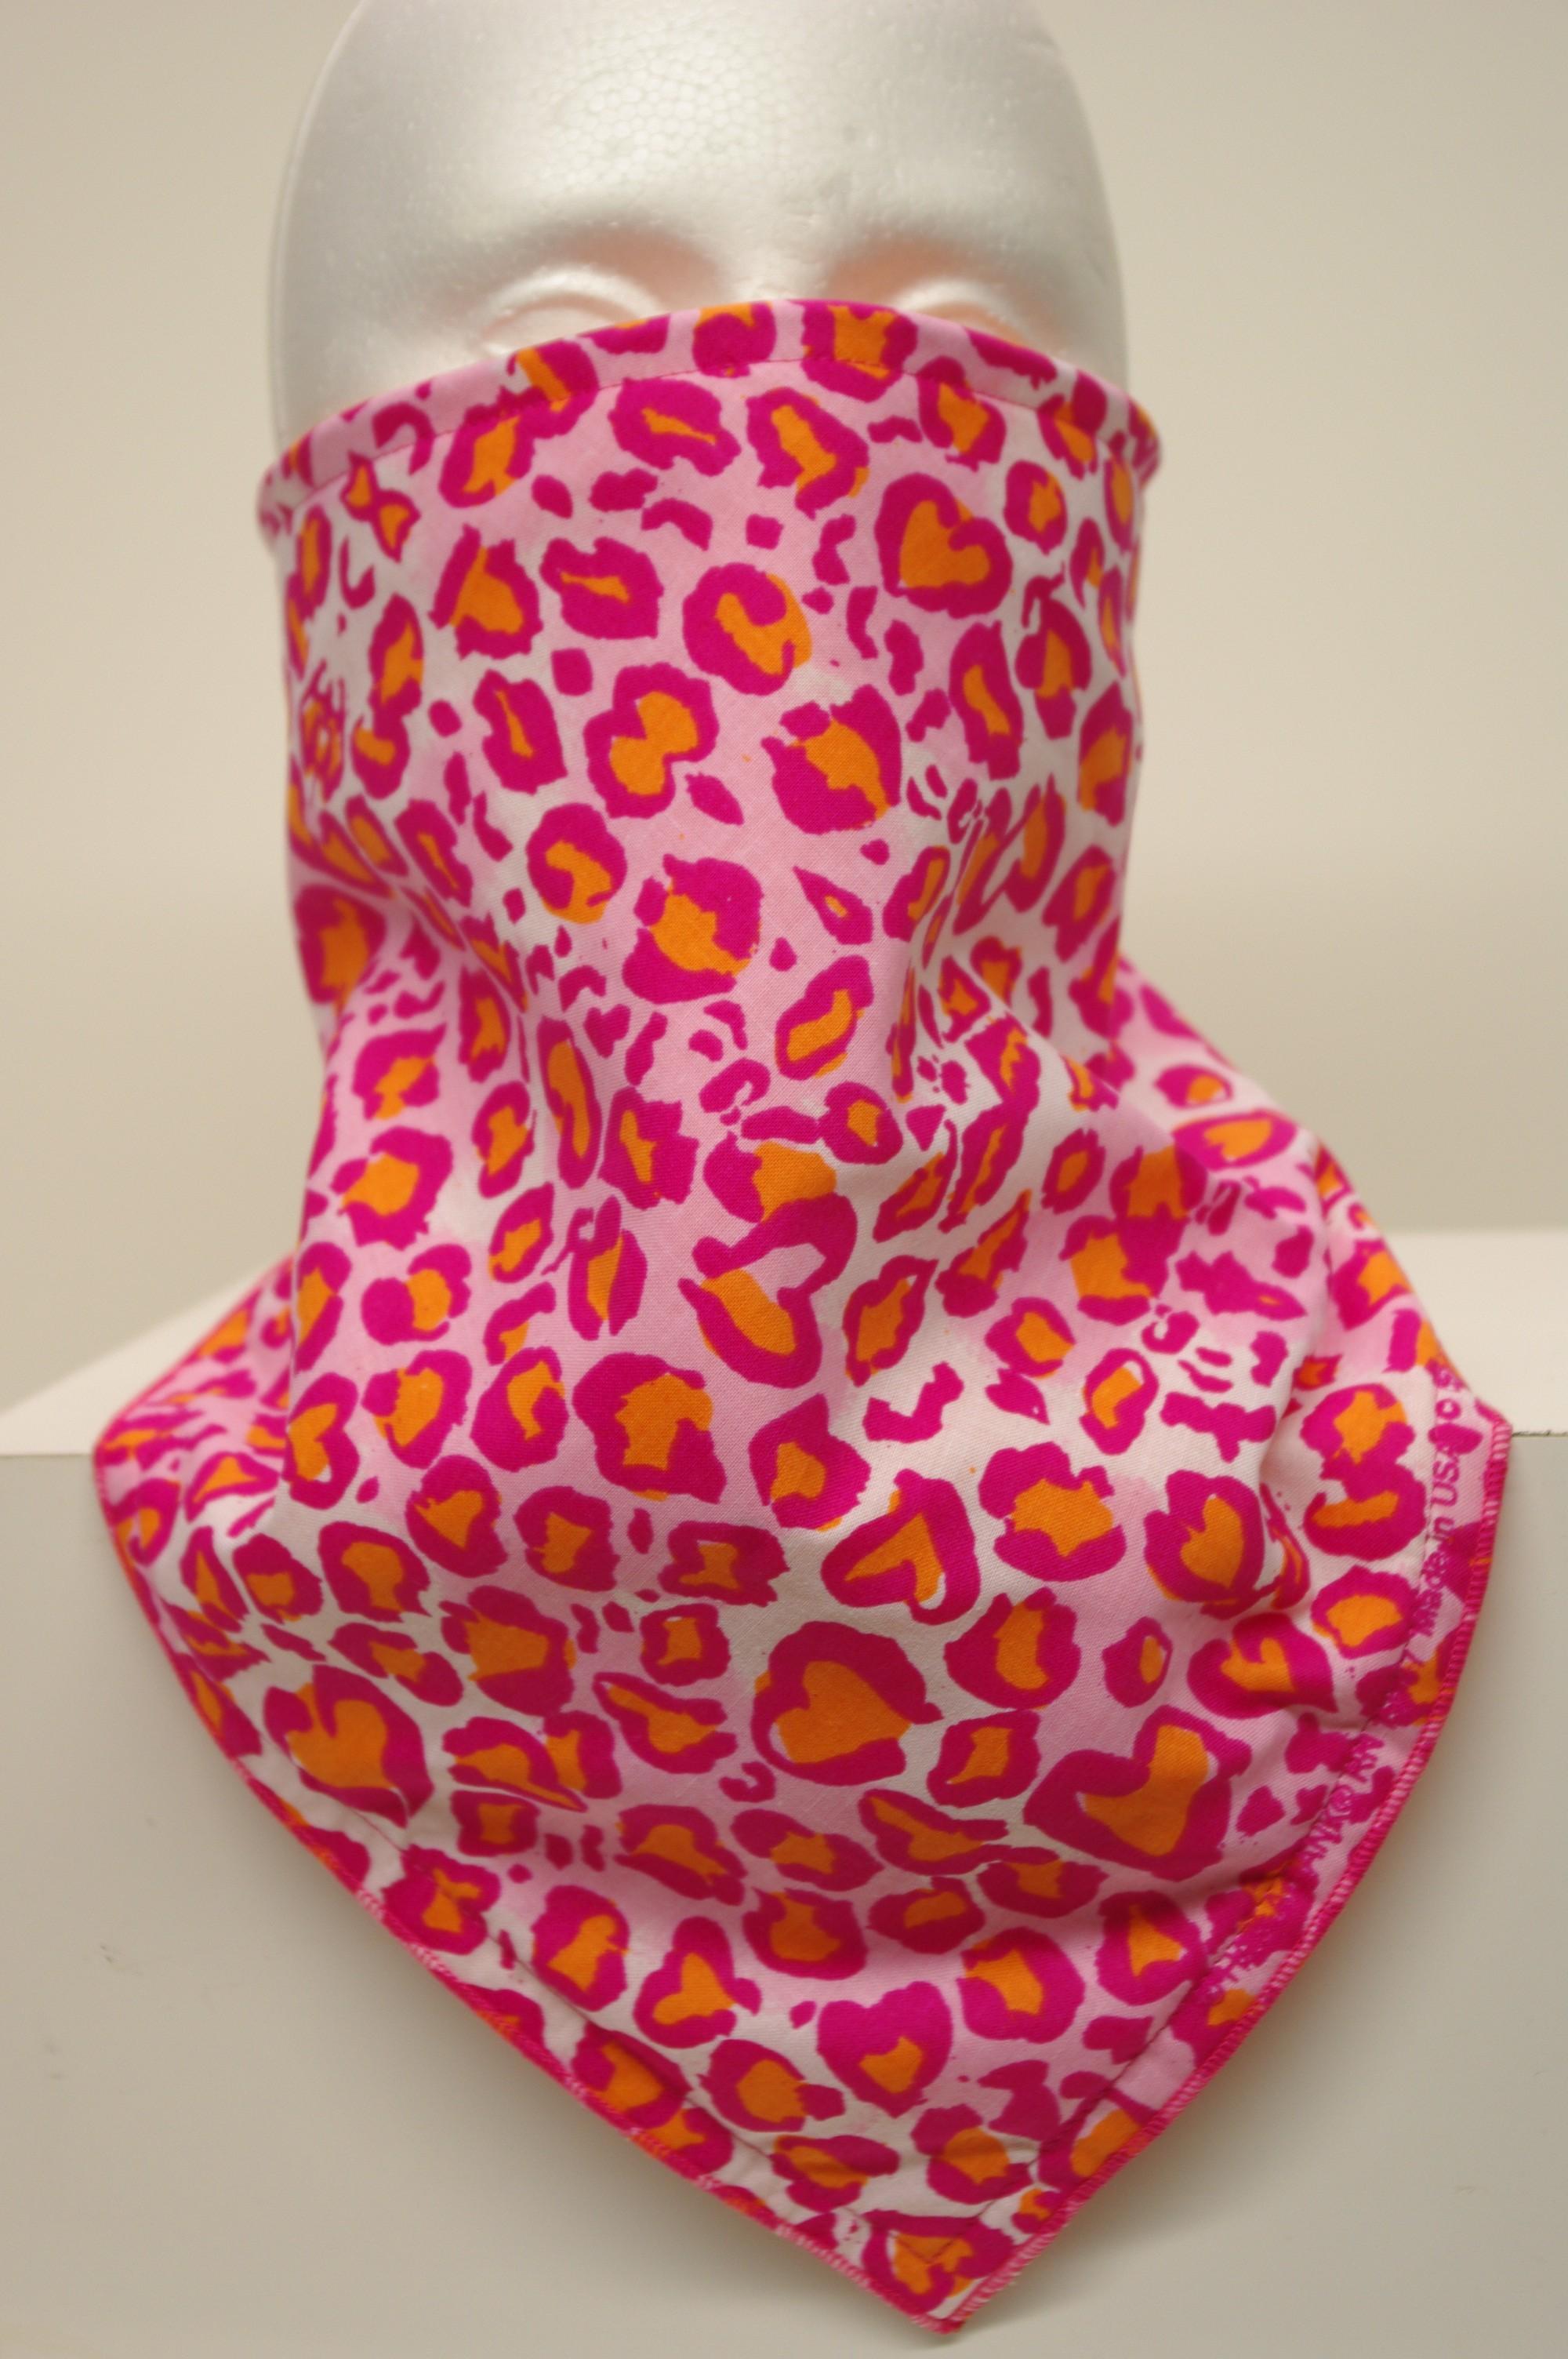 #241 Pink Leopard